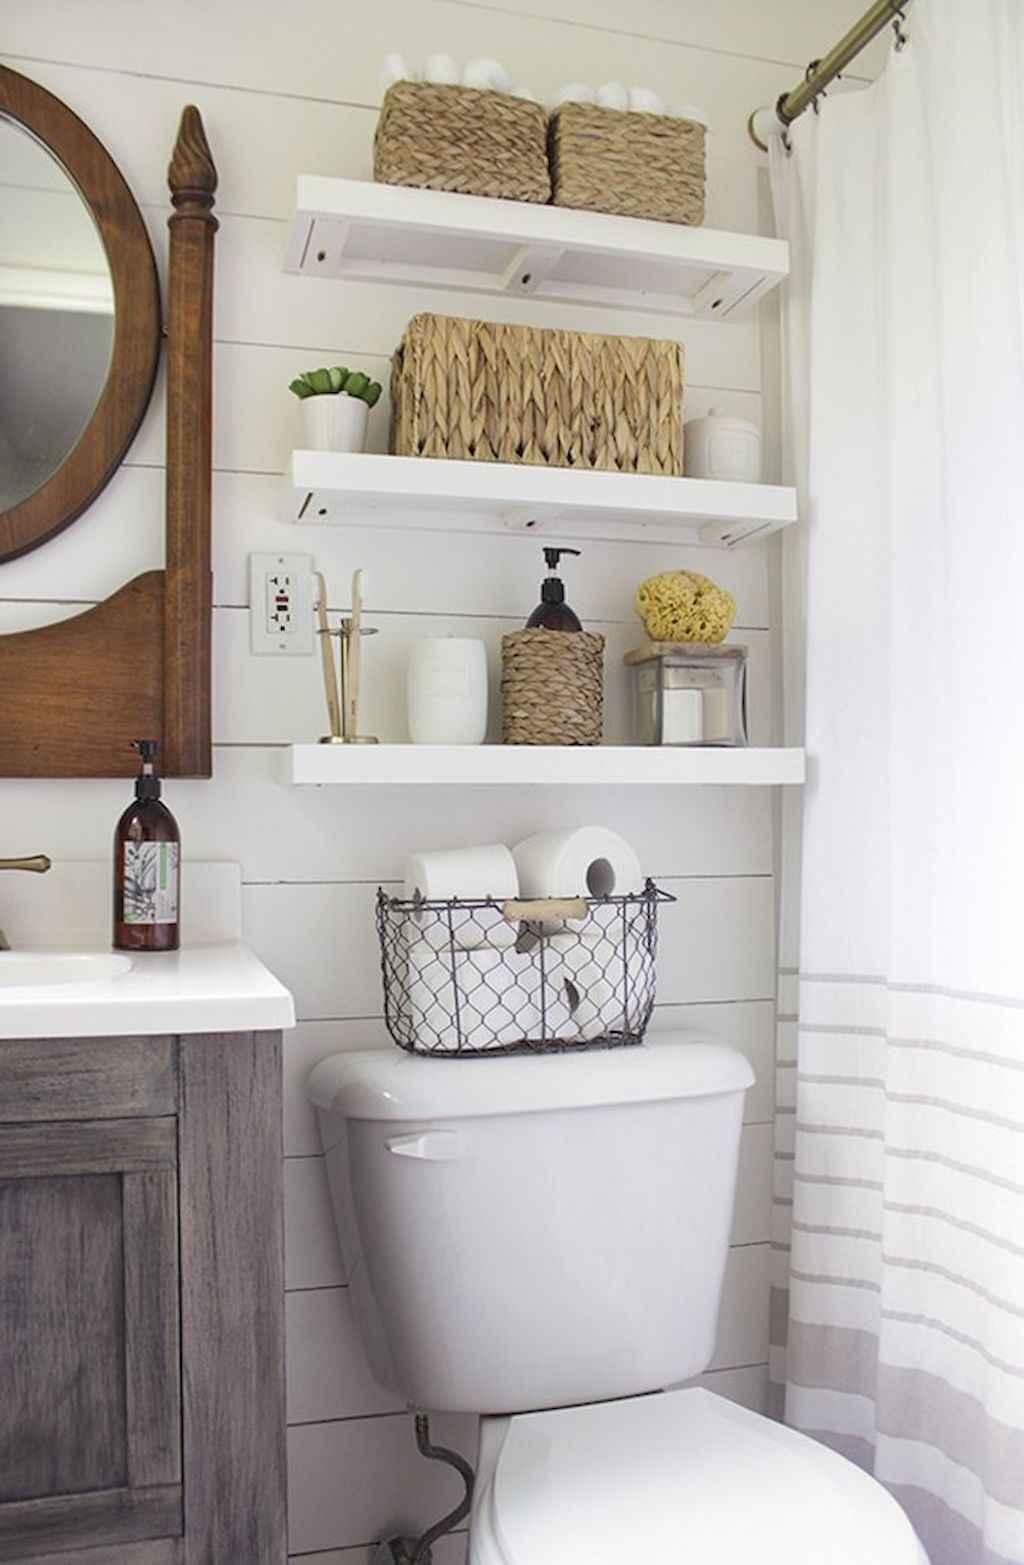 Inspiring apartment bathroom remodel ideas on a budget (13)